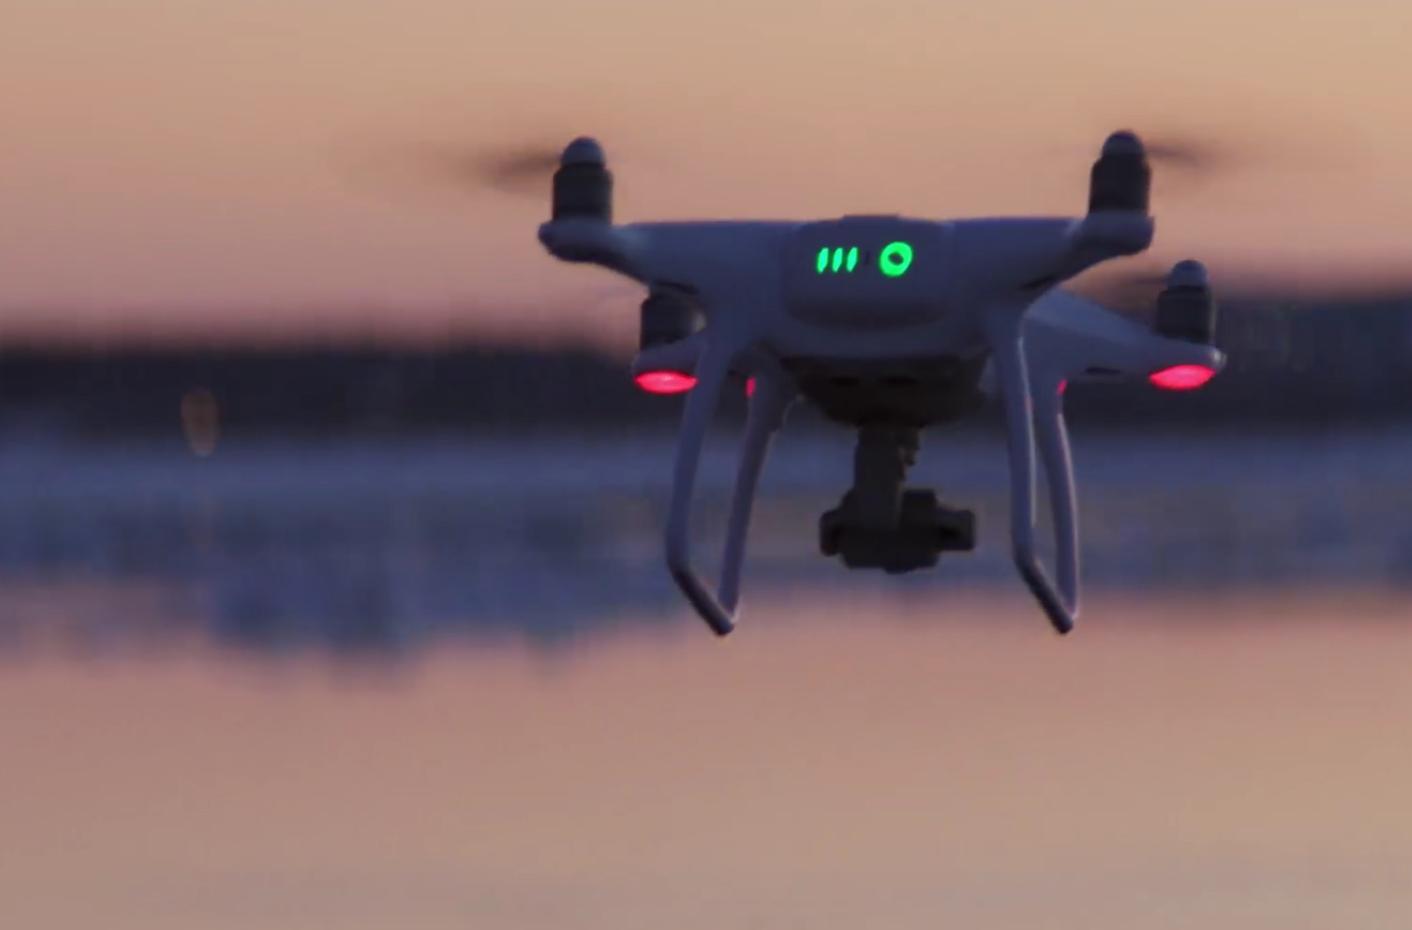 the dji phantom 4 drone capturing a sunset